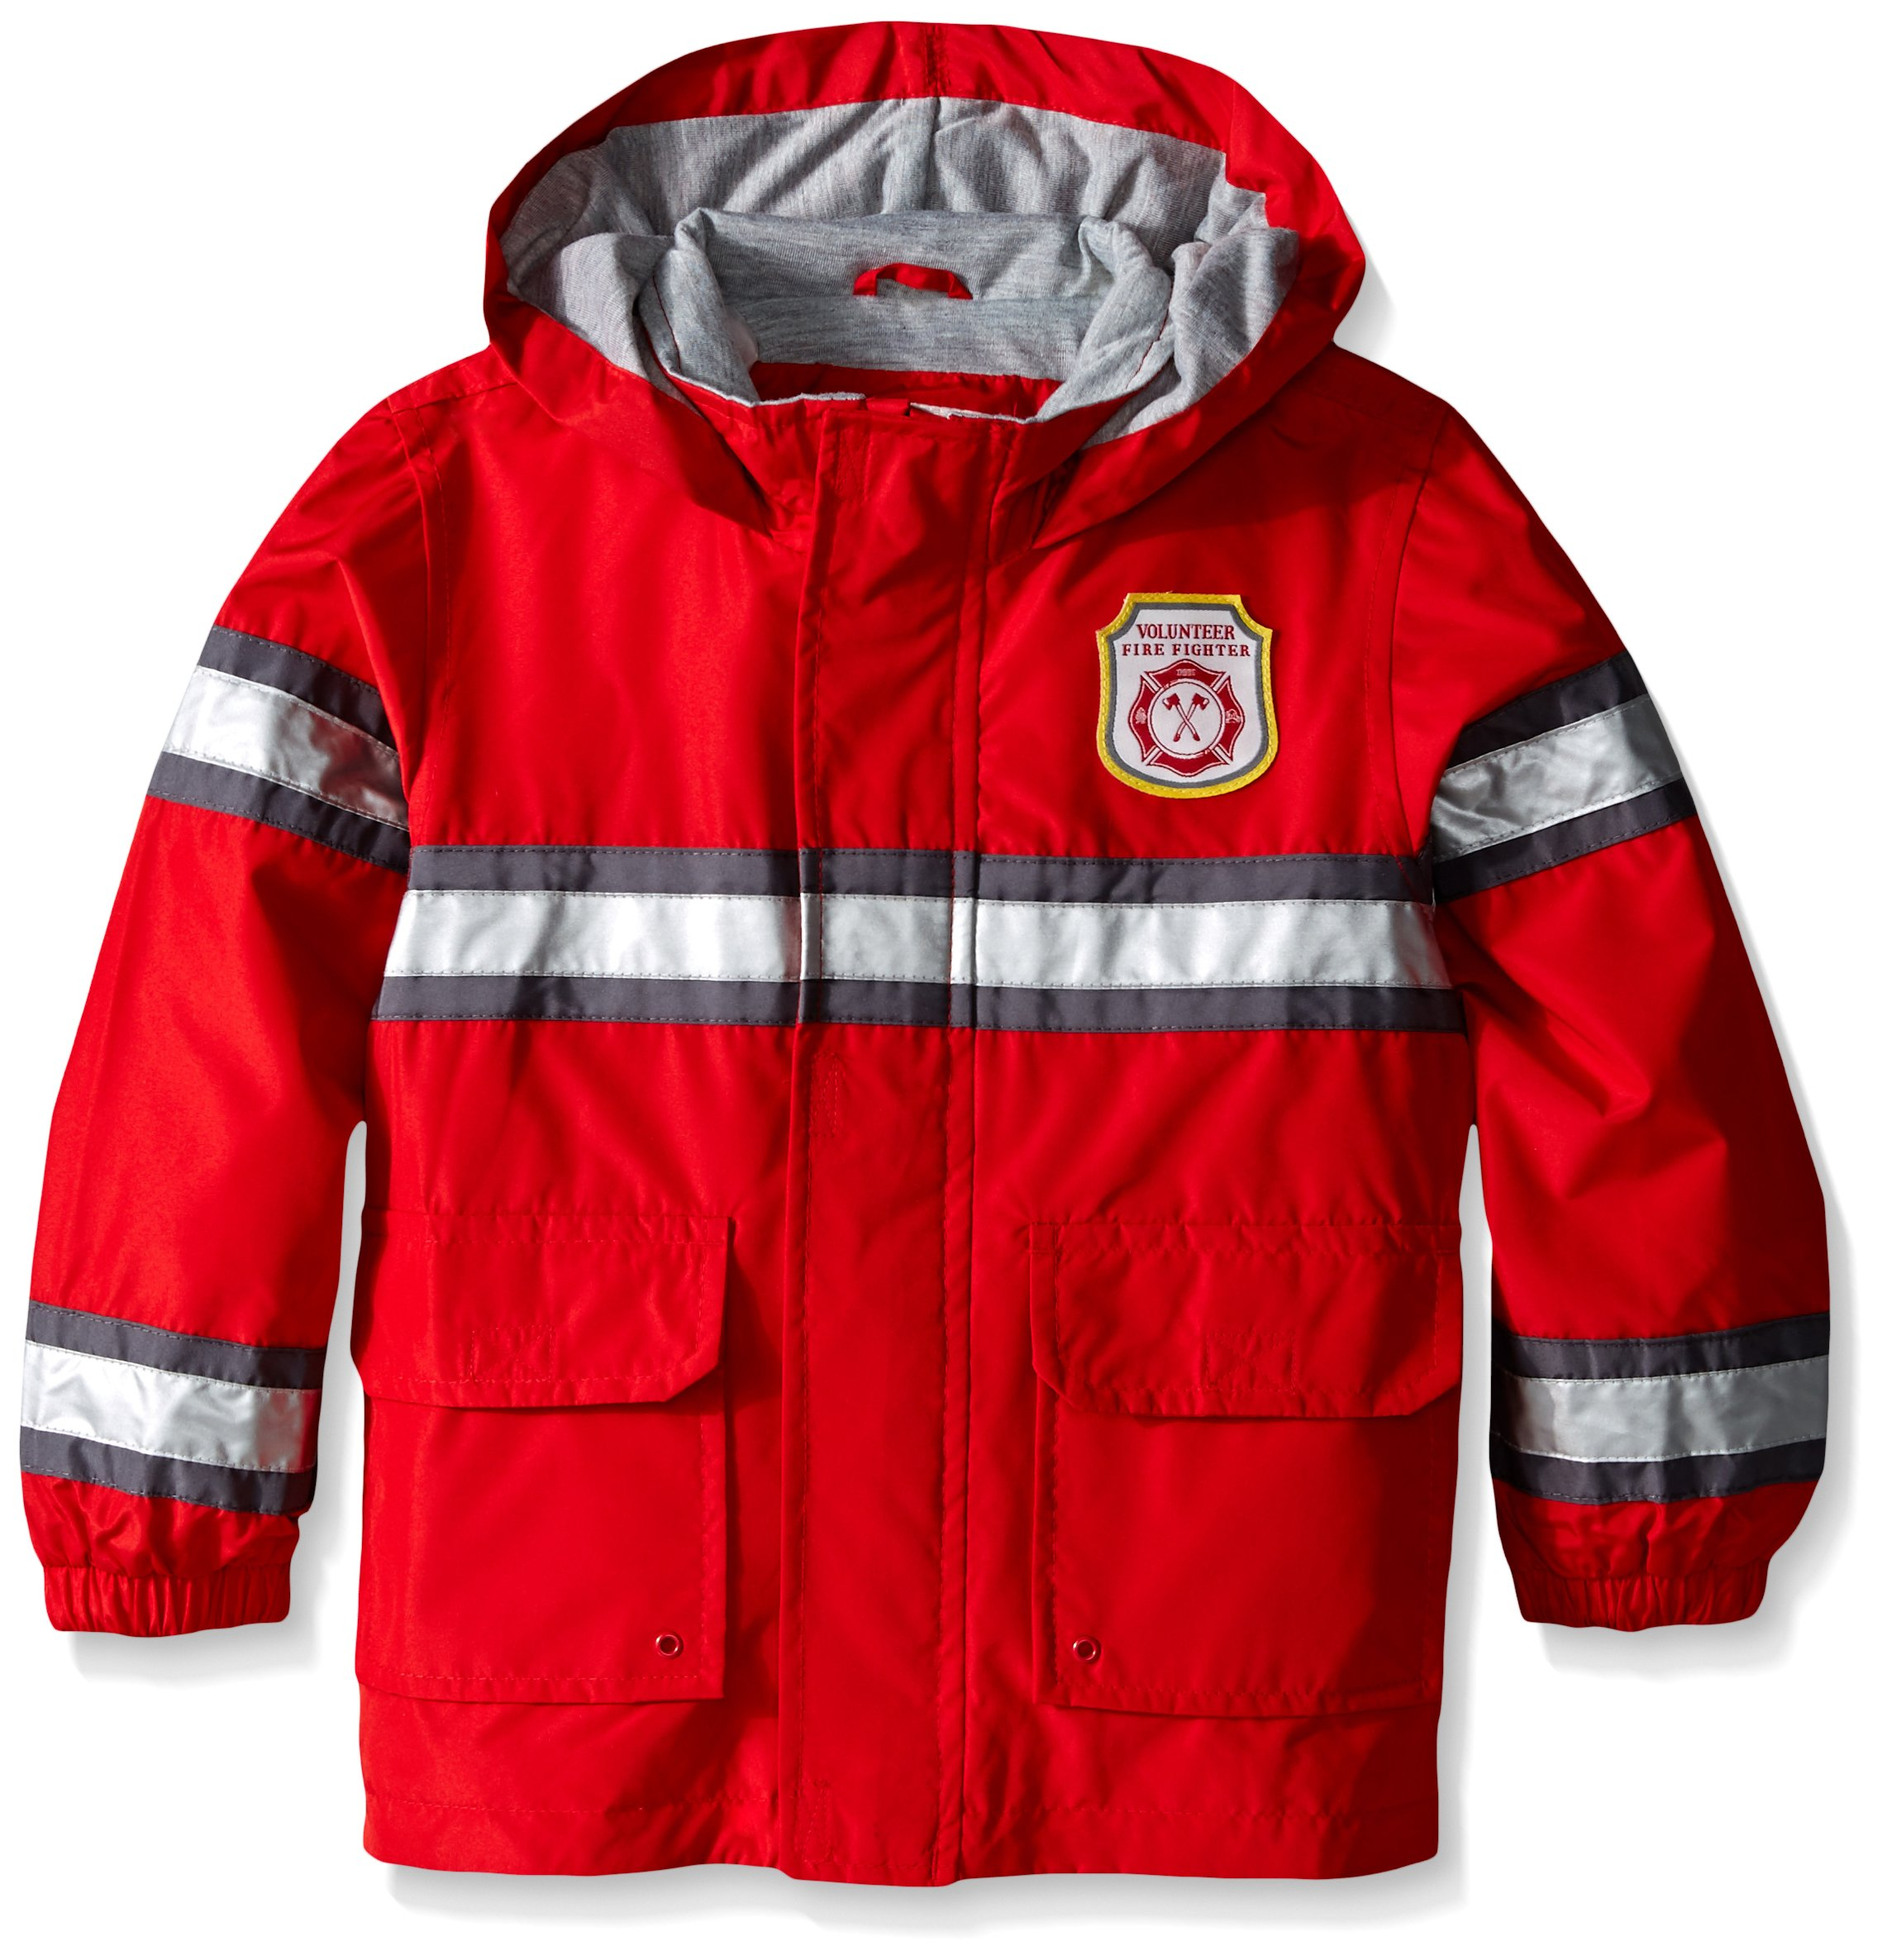 Carter's Boys' Raincoat Fireman Slicker, Red, 7